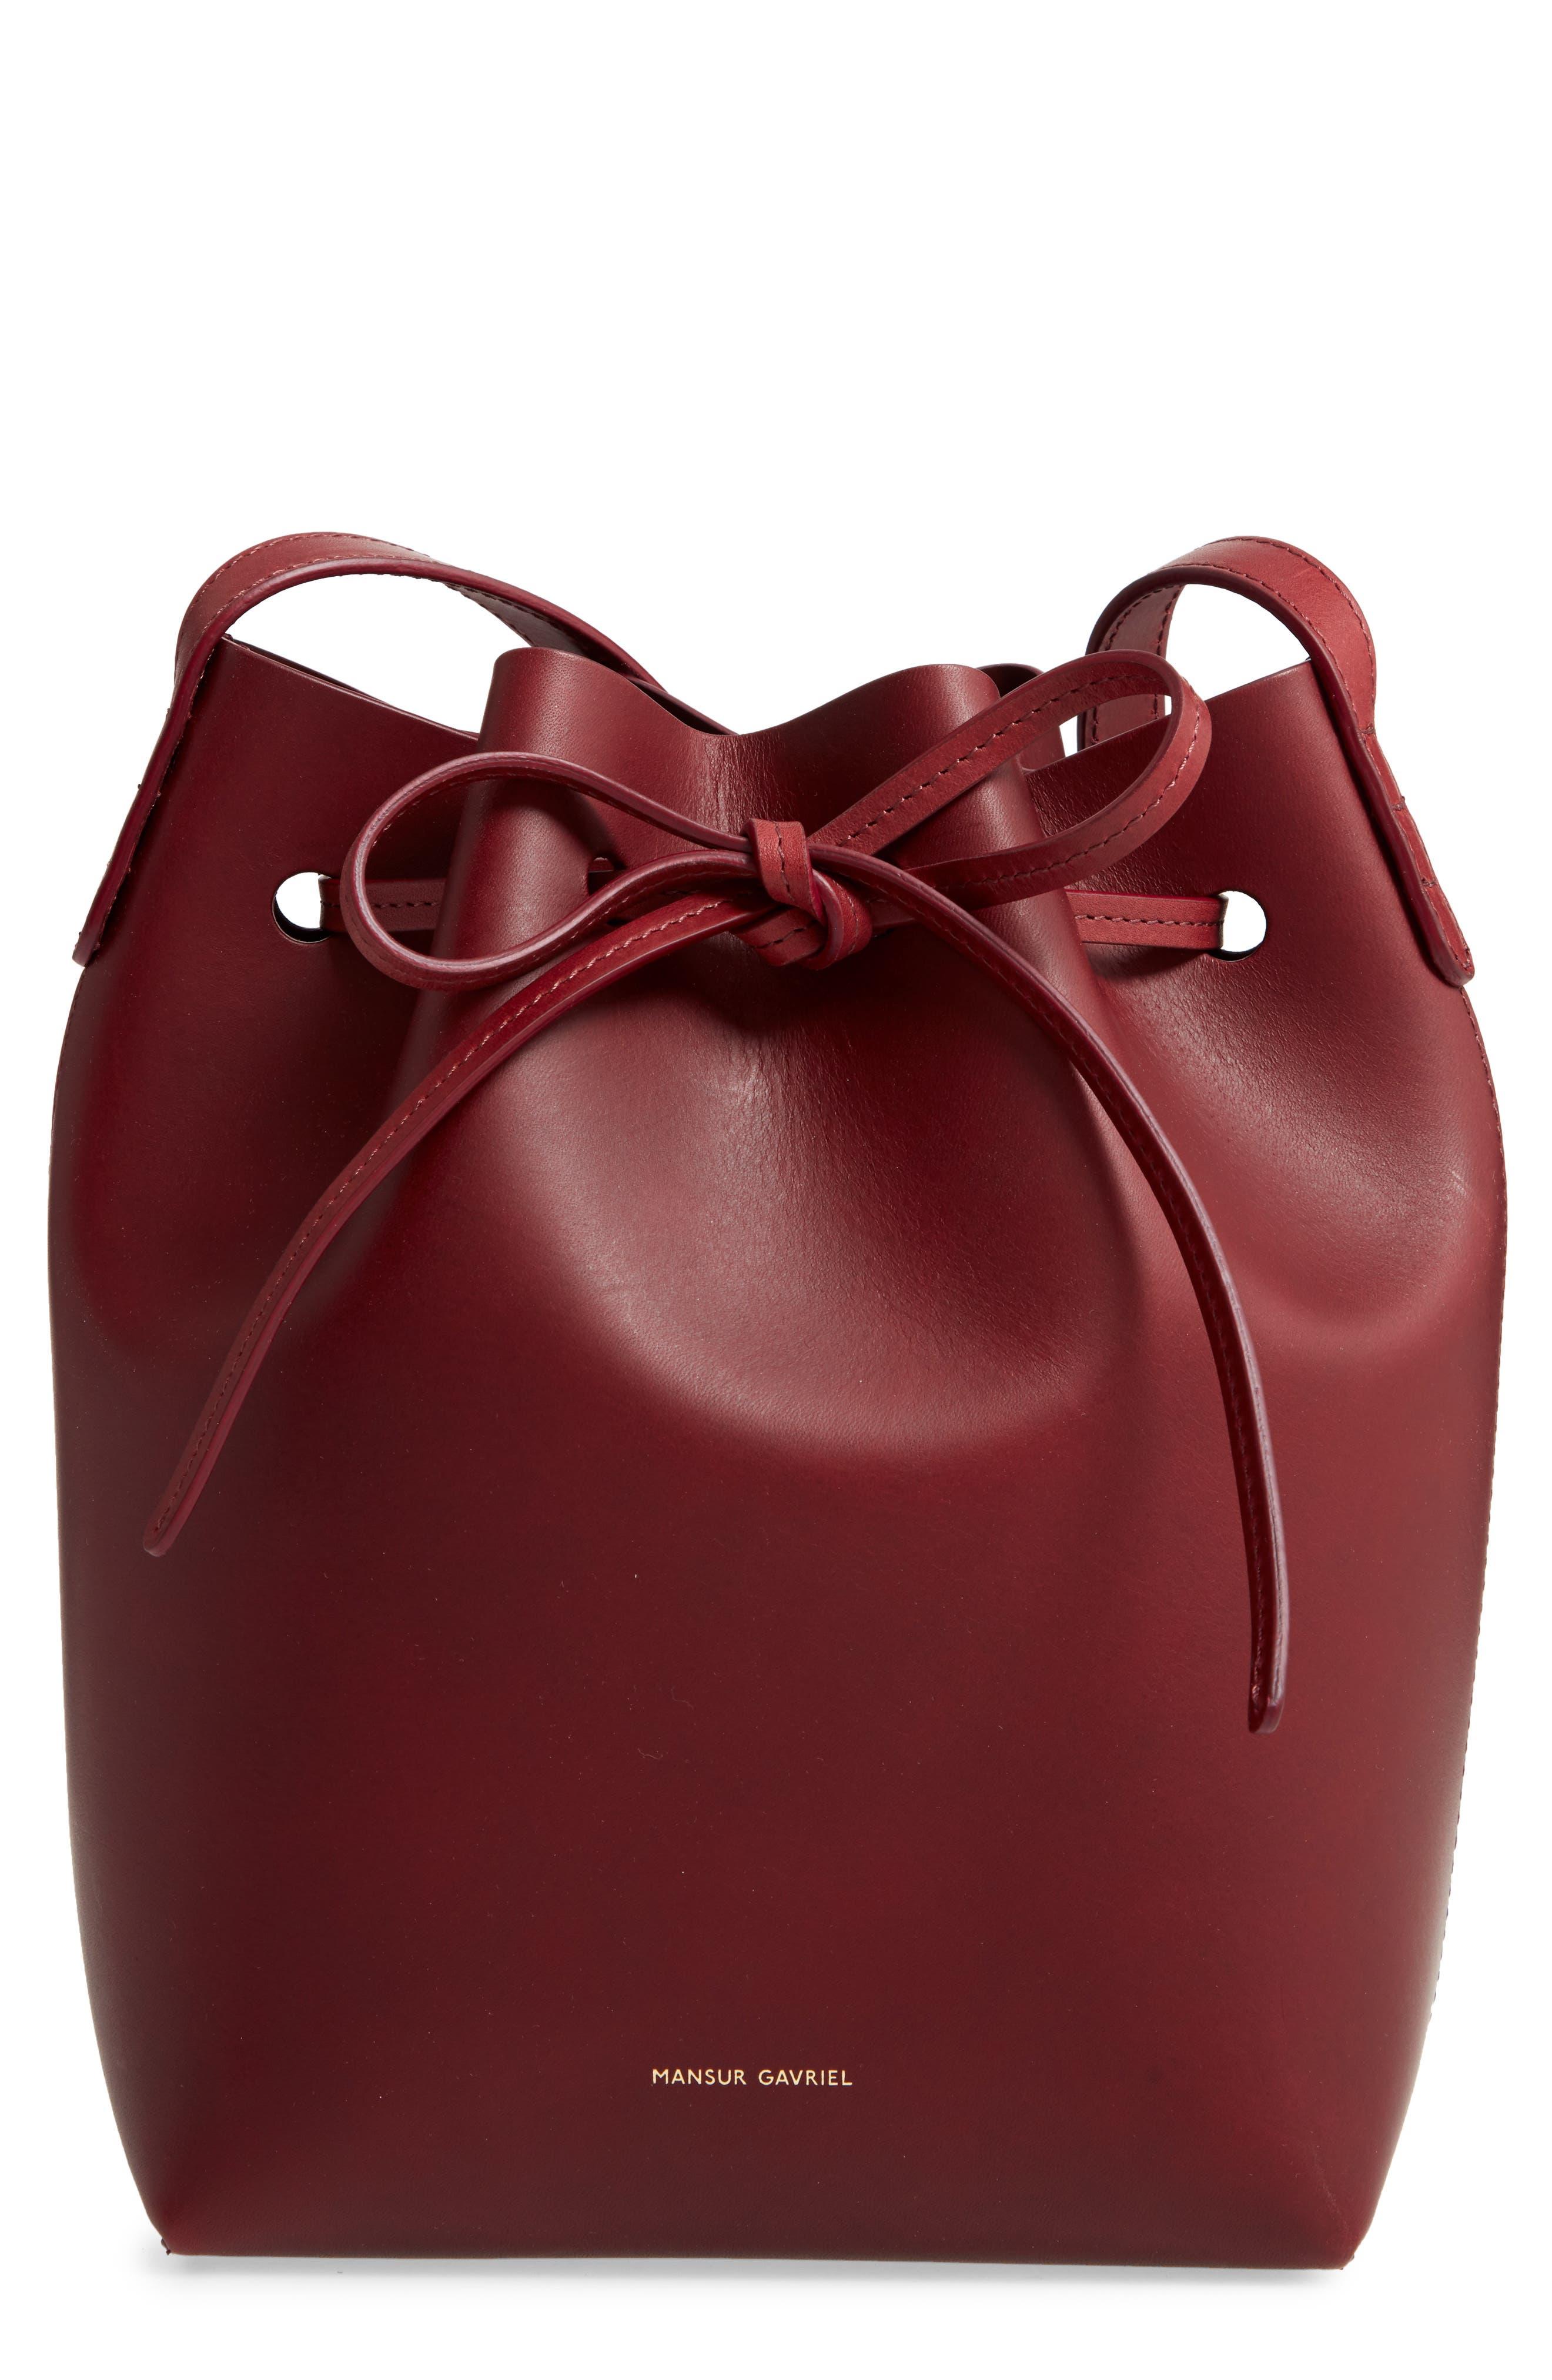 Mansur Gavriel Bags Mini Leather Bucket Bag